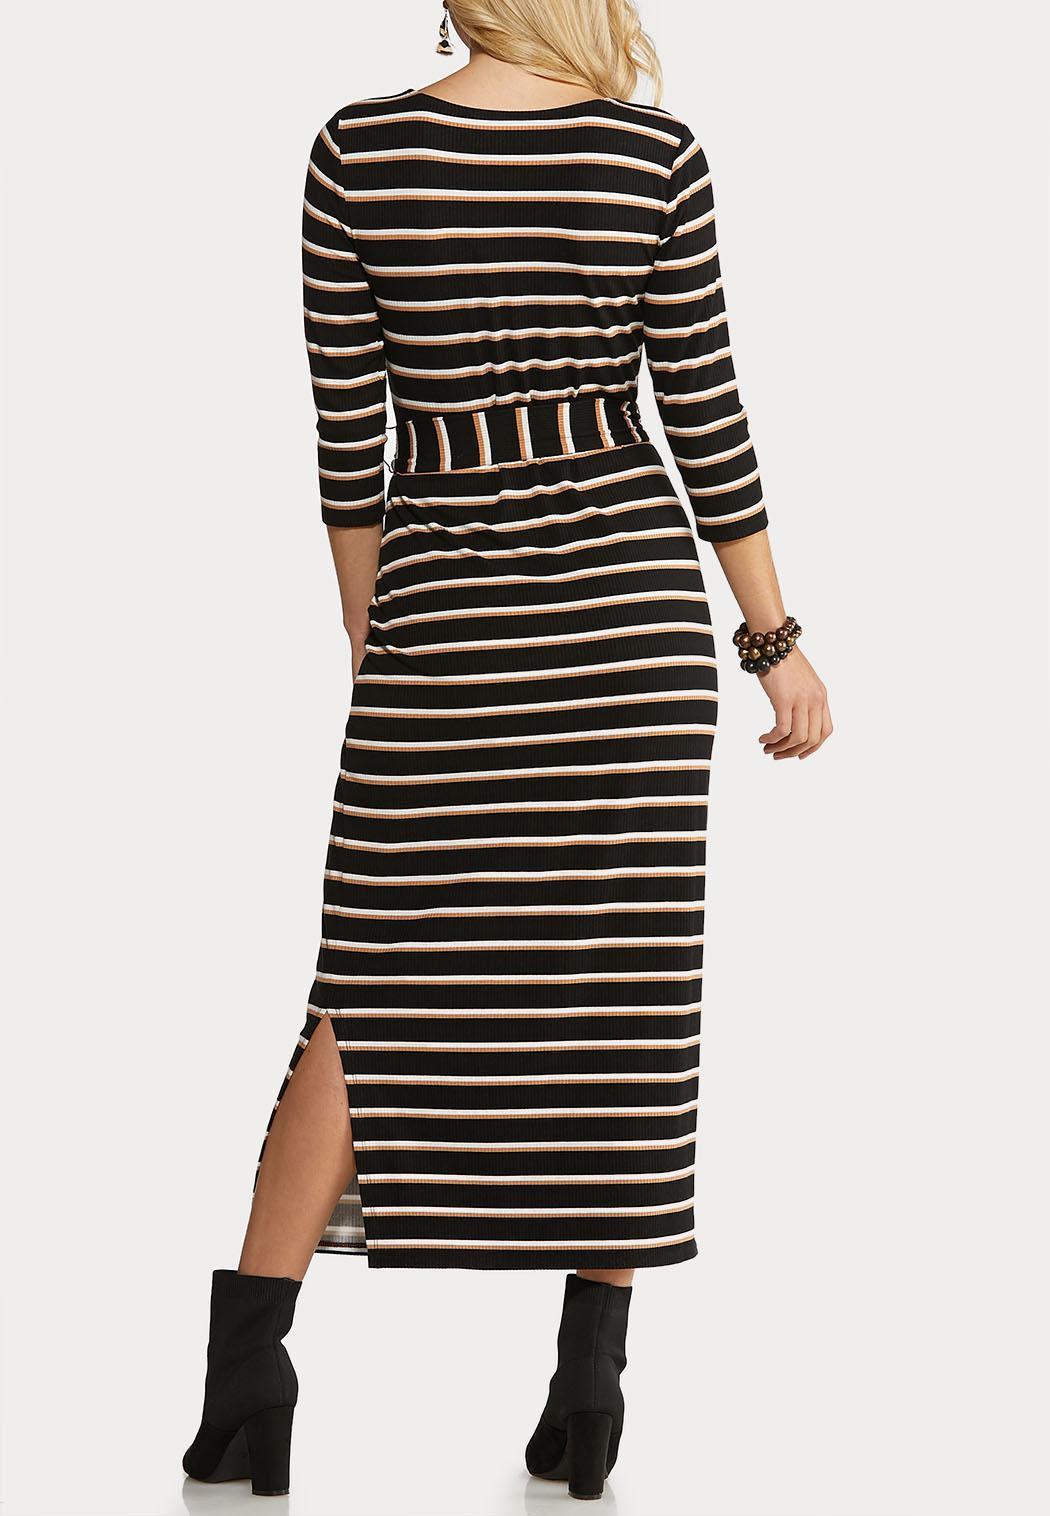 Plus Size Belted Stripe Knit Dress (Item #44070443)